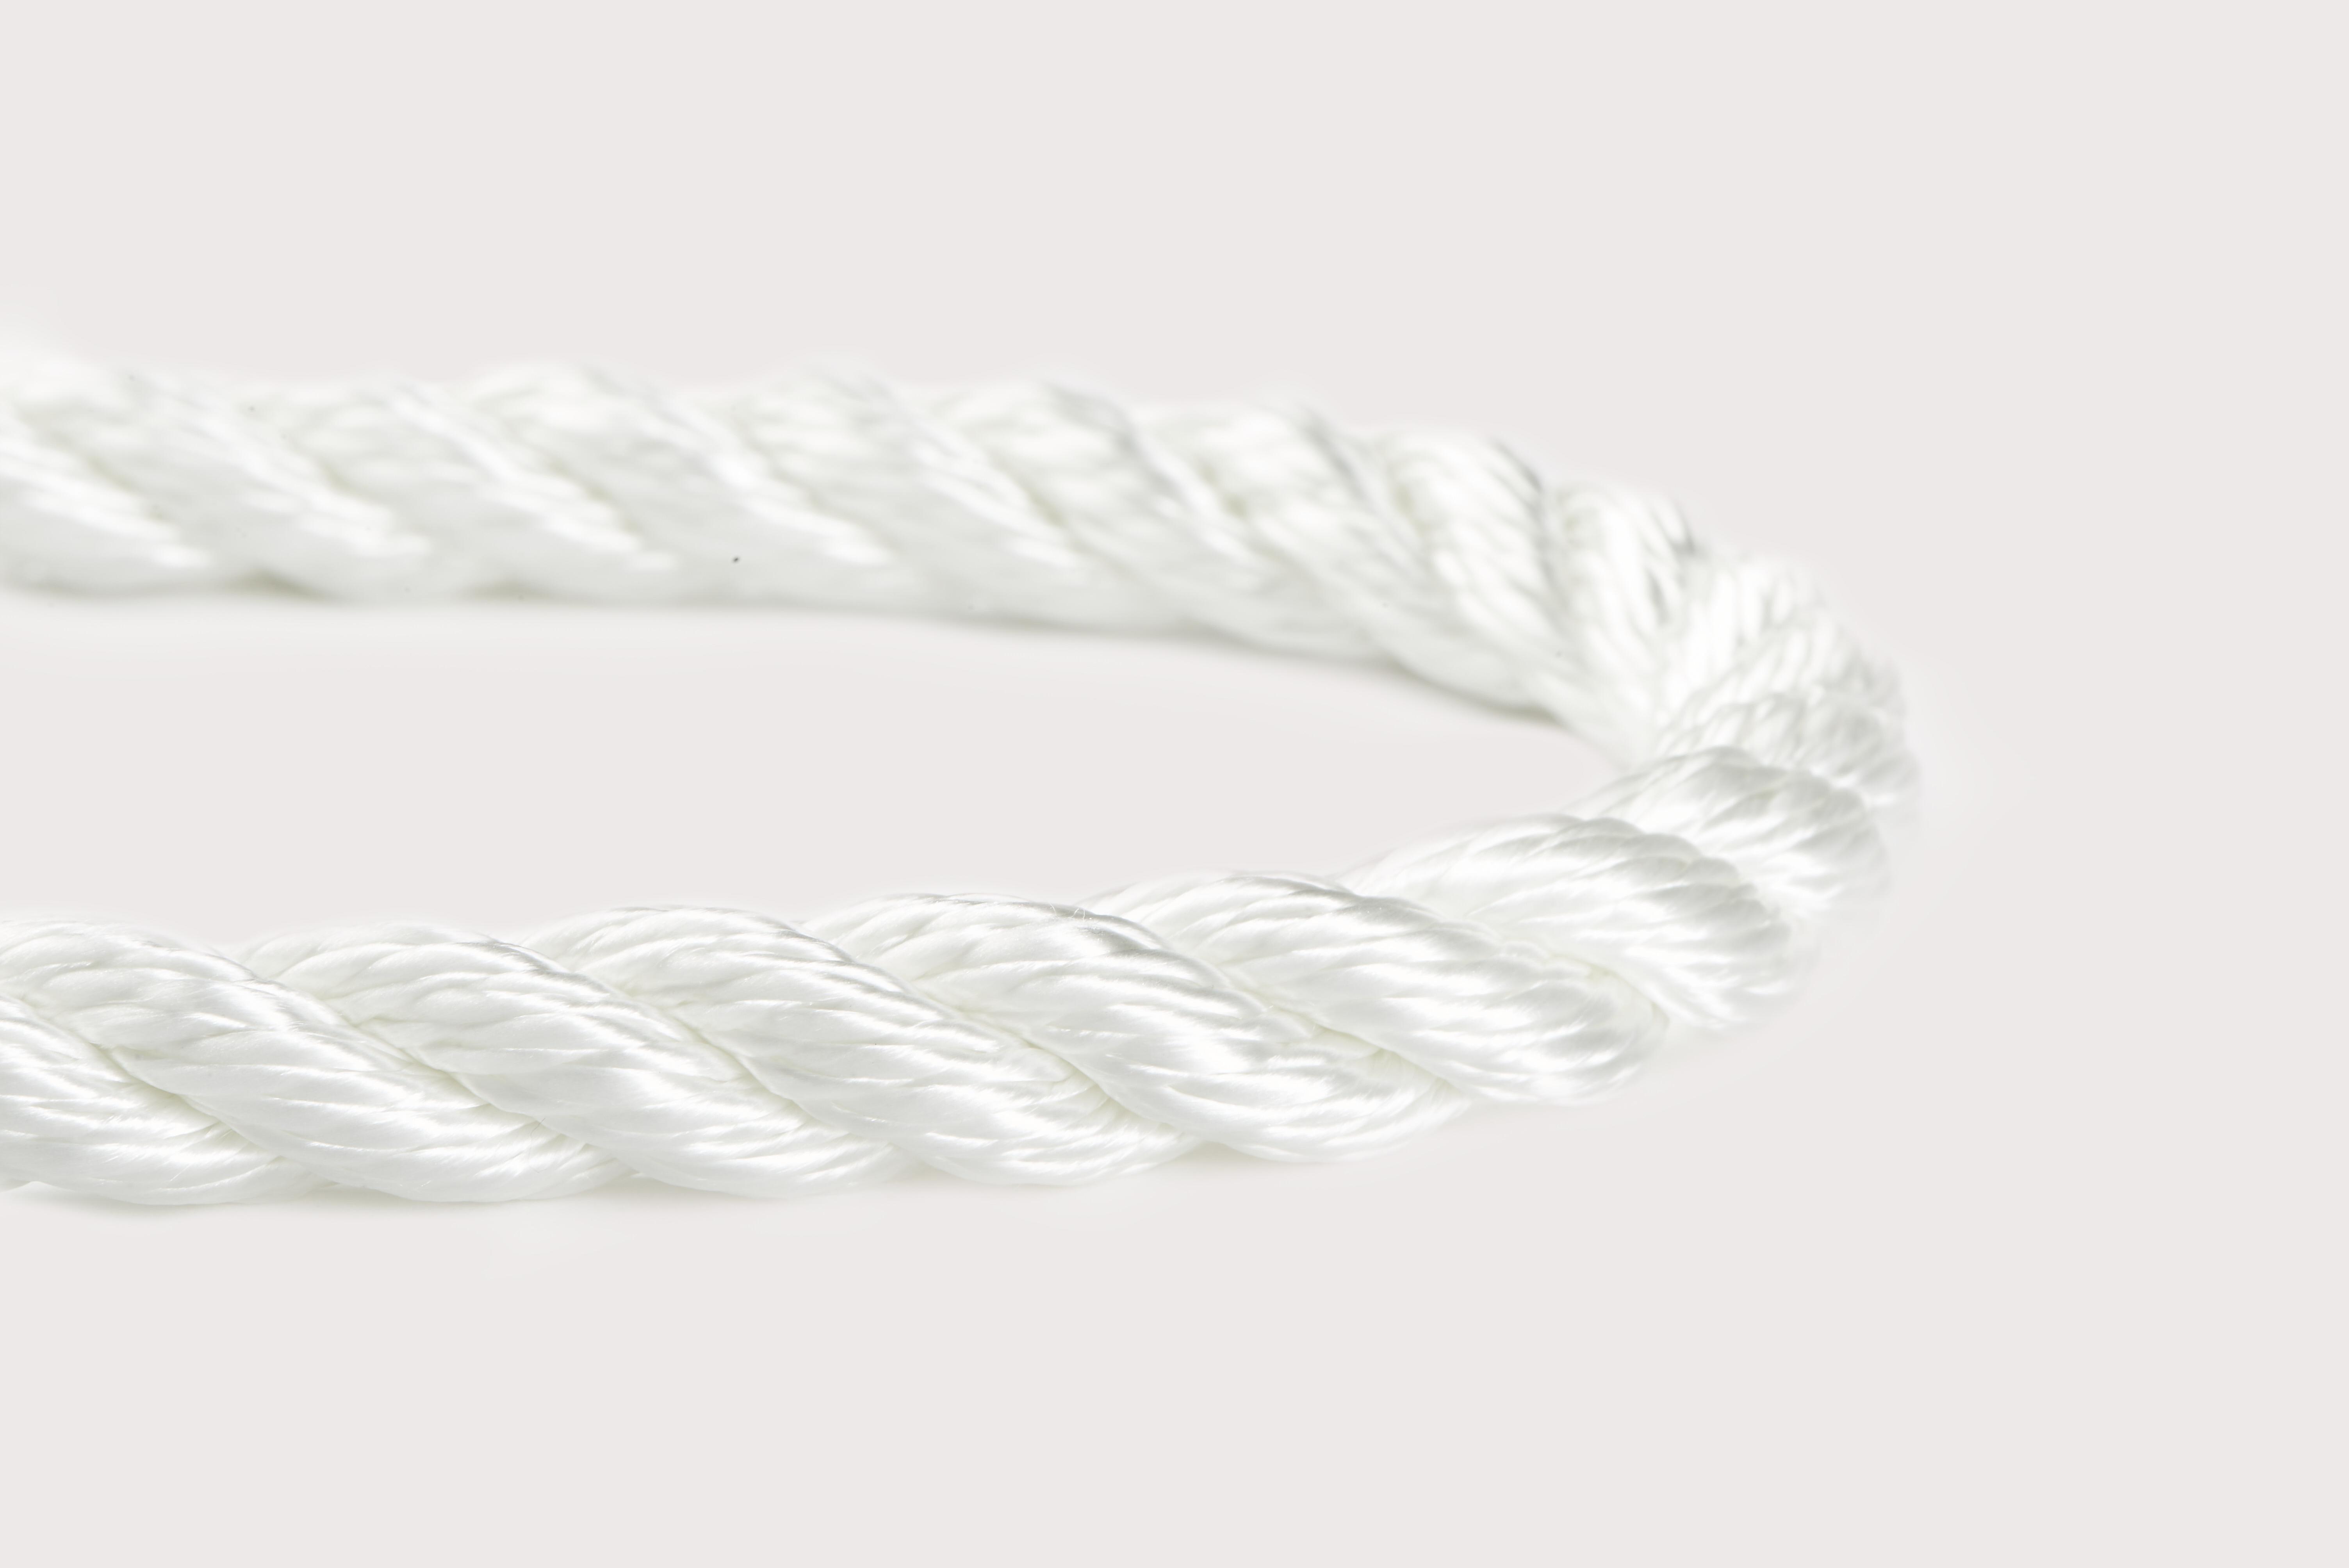 Orion-Cordage-Industrial 3-Strand Nylon-White-Curved182.jpg